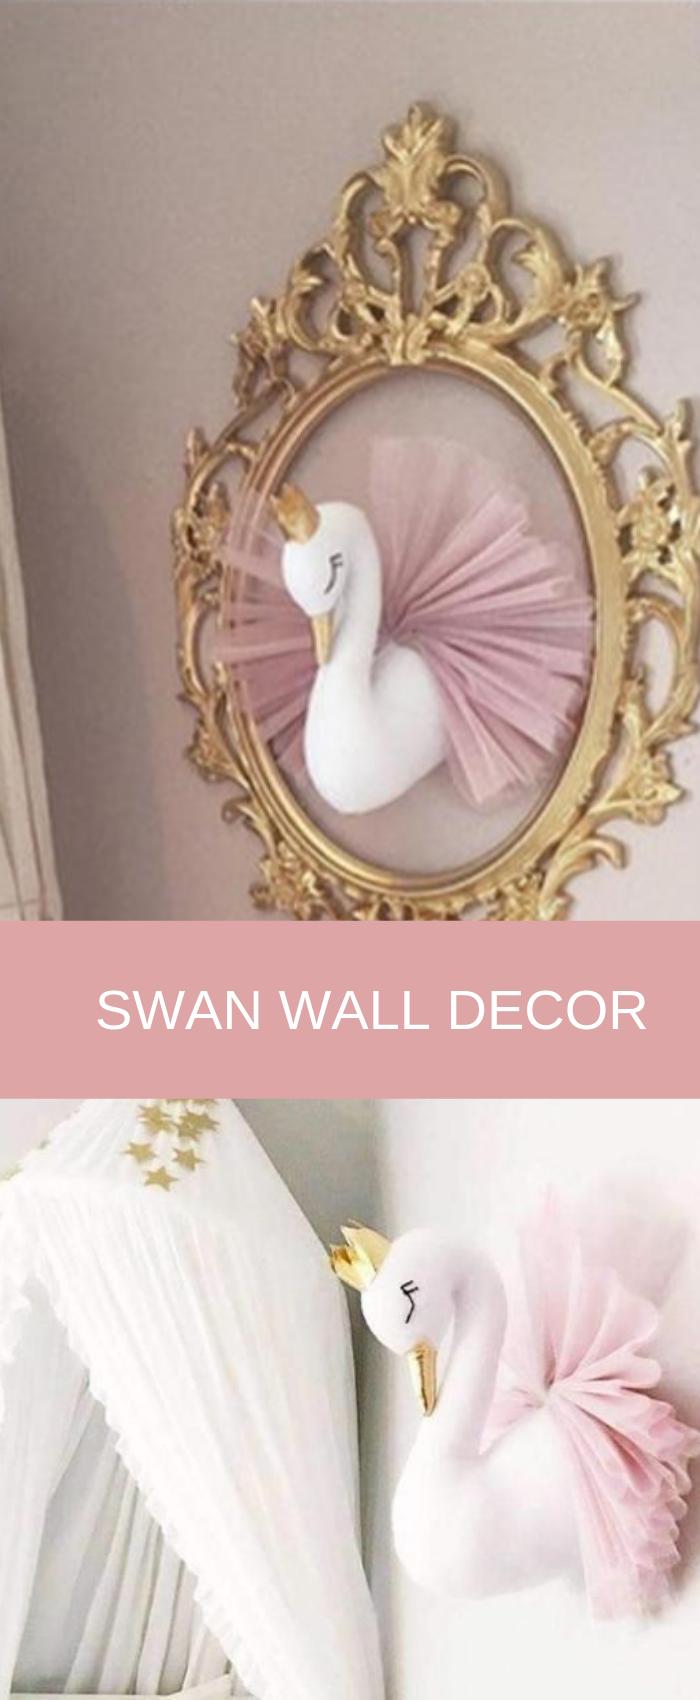 Swan Wall Decor Hanging Wall Decor Wall Decor Nursery Wall Decor